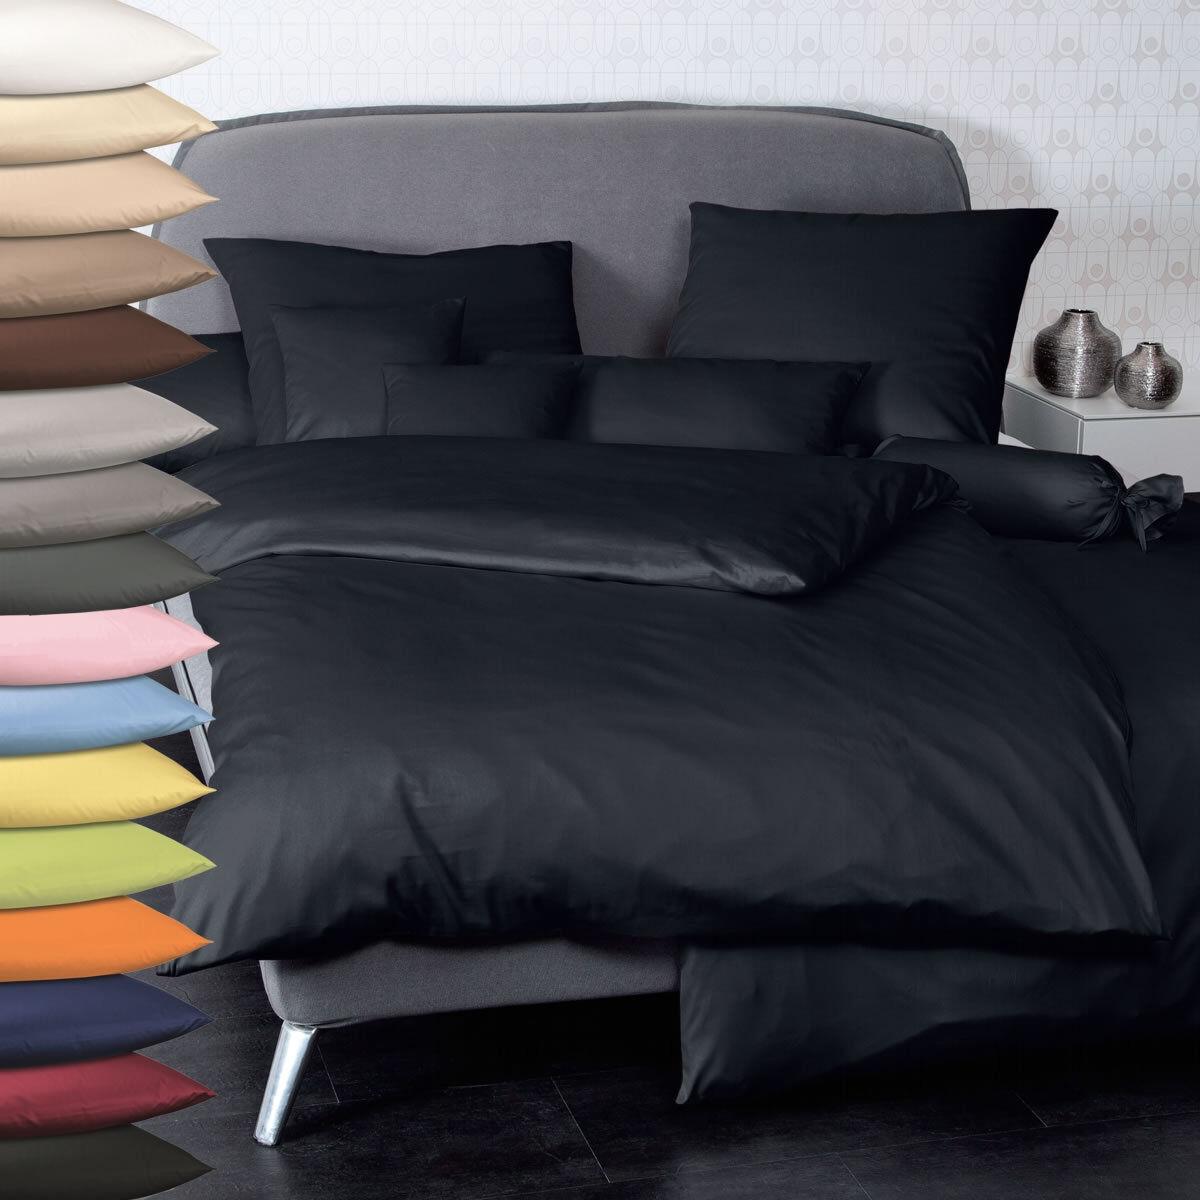 Janine Uni Mako Satin Bettwäsche Programm Farbes Design 31001 Kissenbezug